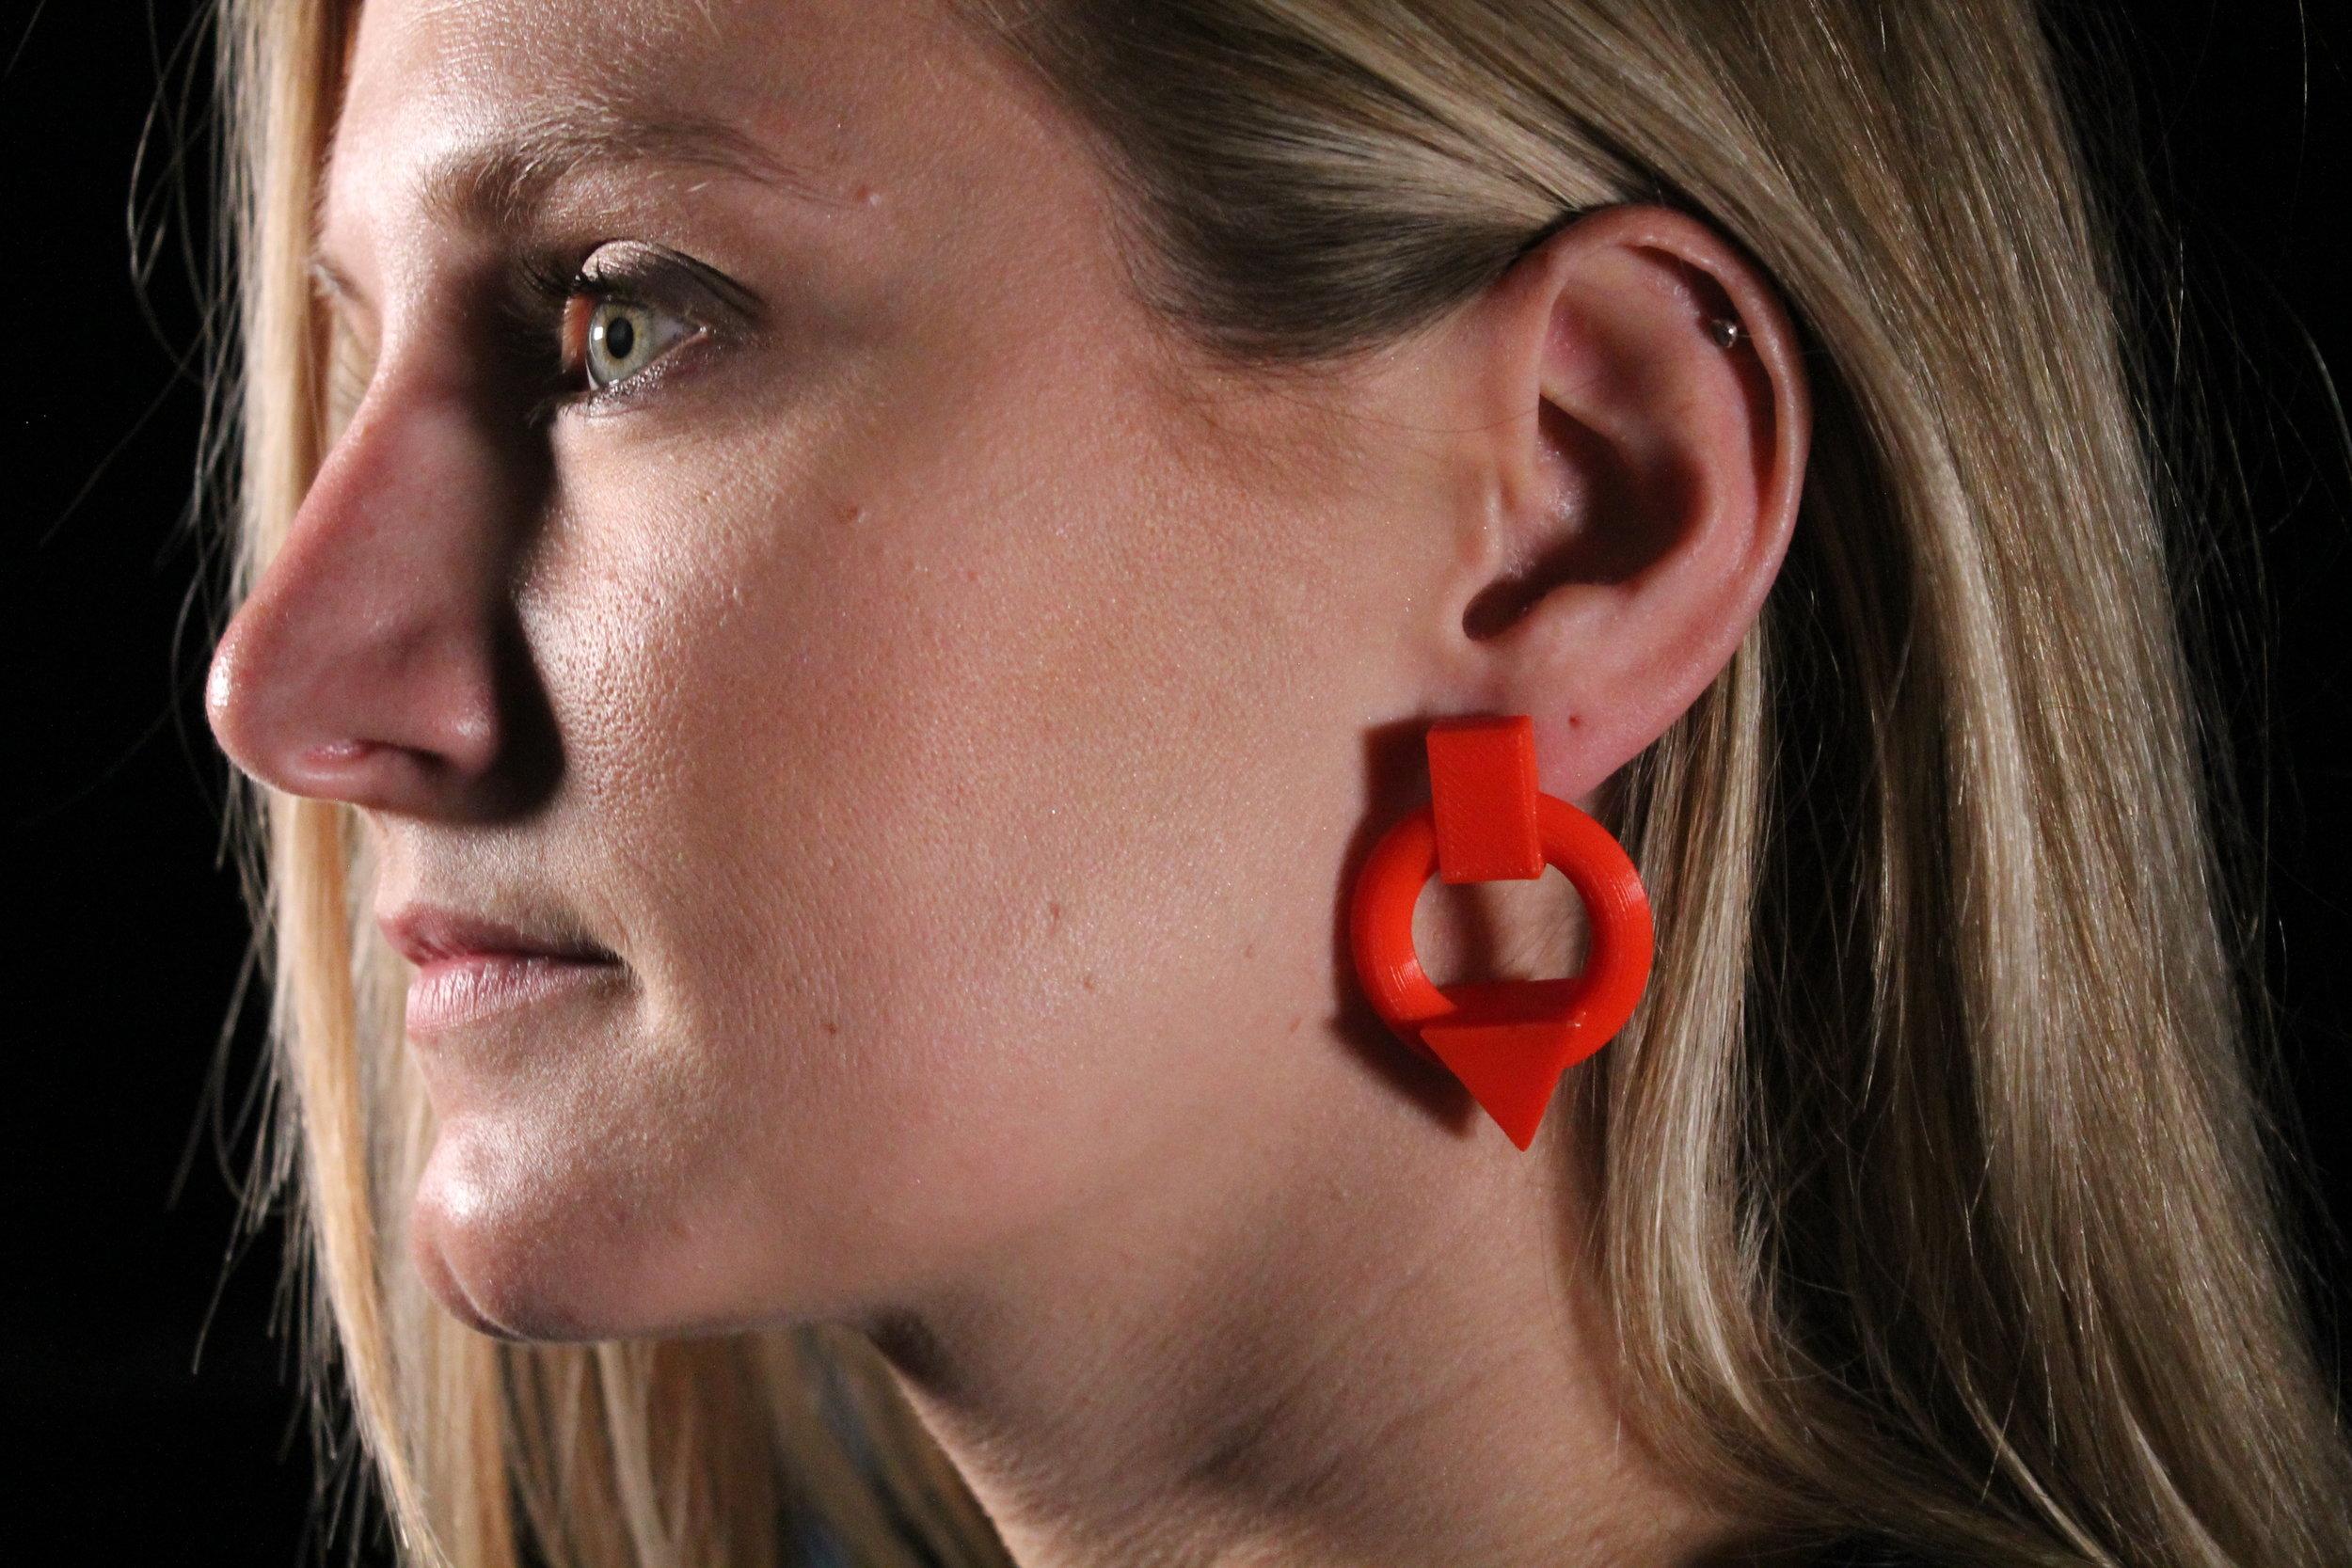 block-earrings_34987746431_o.jpg